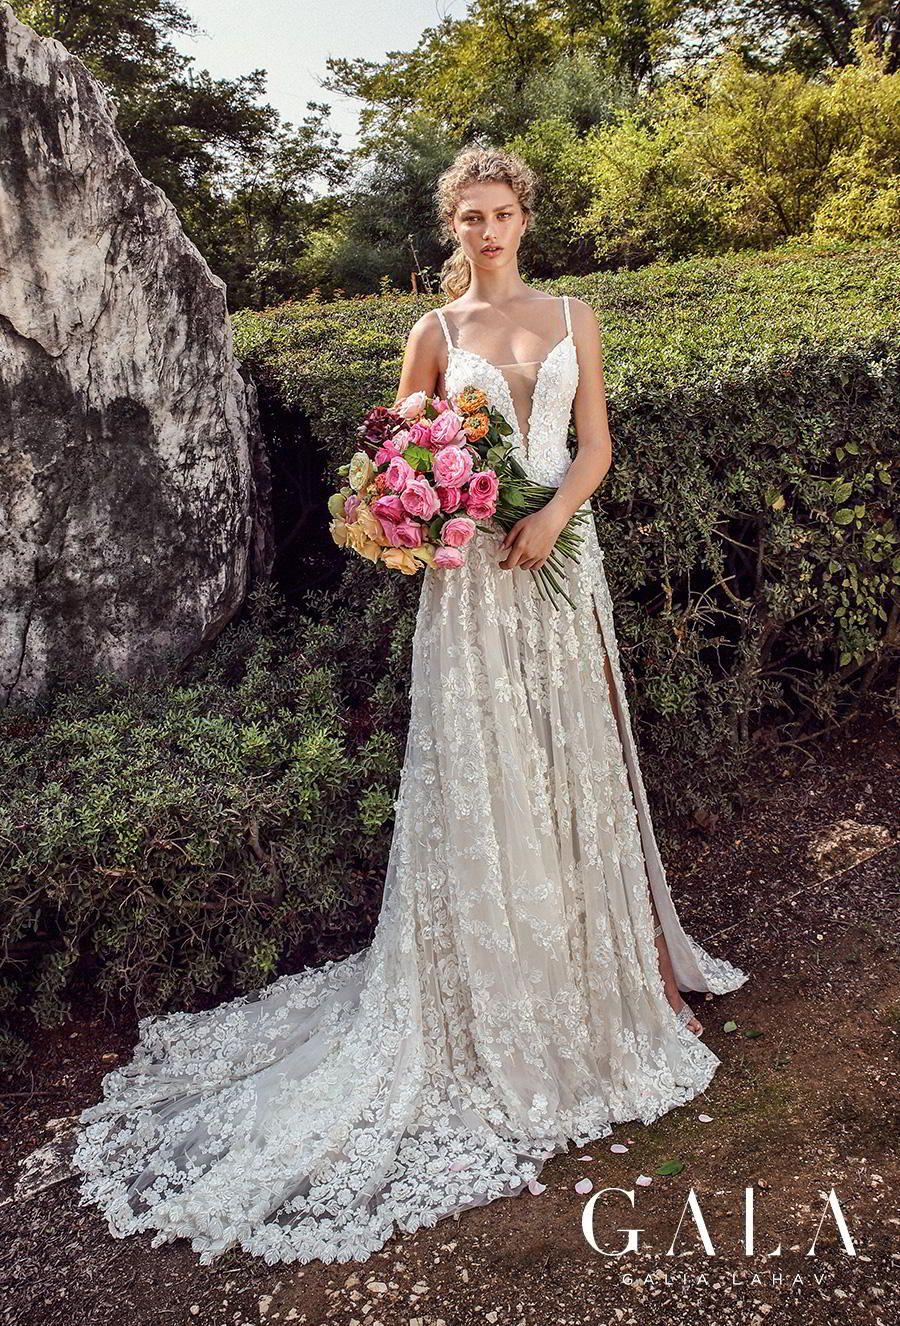 galia lahav gala fall 2019 bridal sleeveless spaghetti